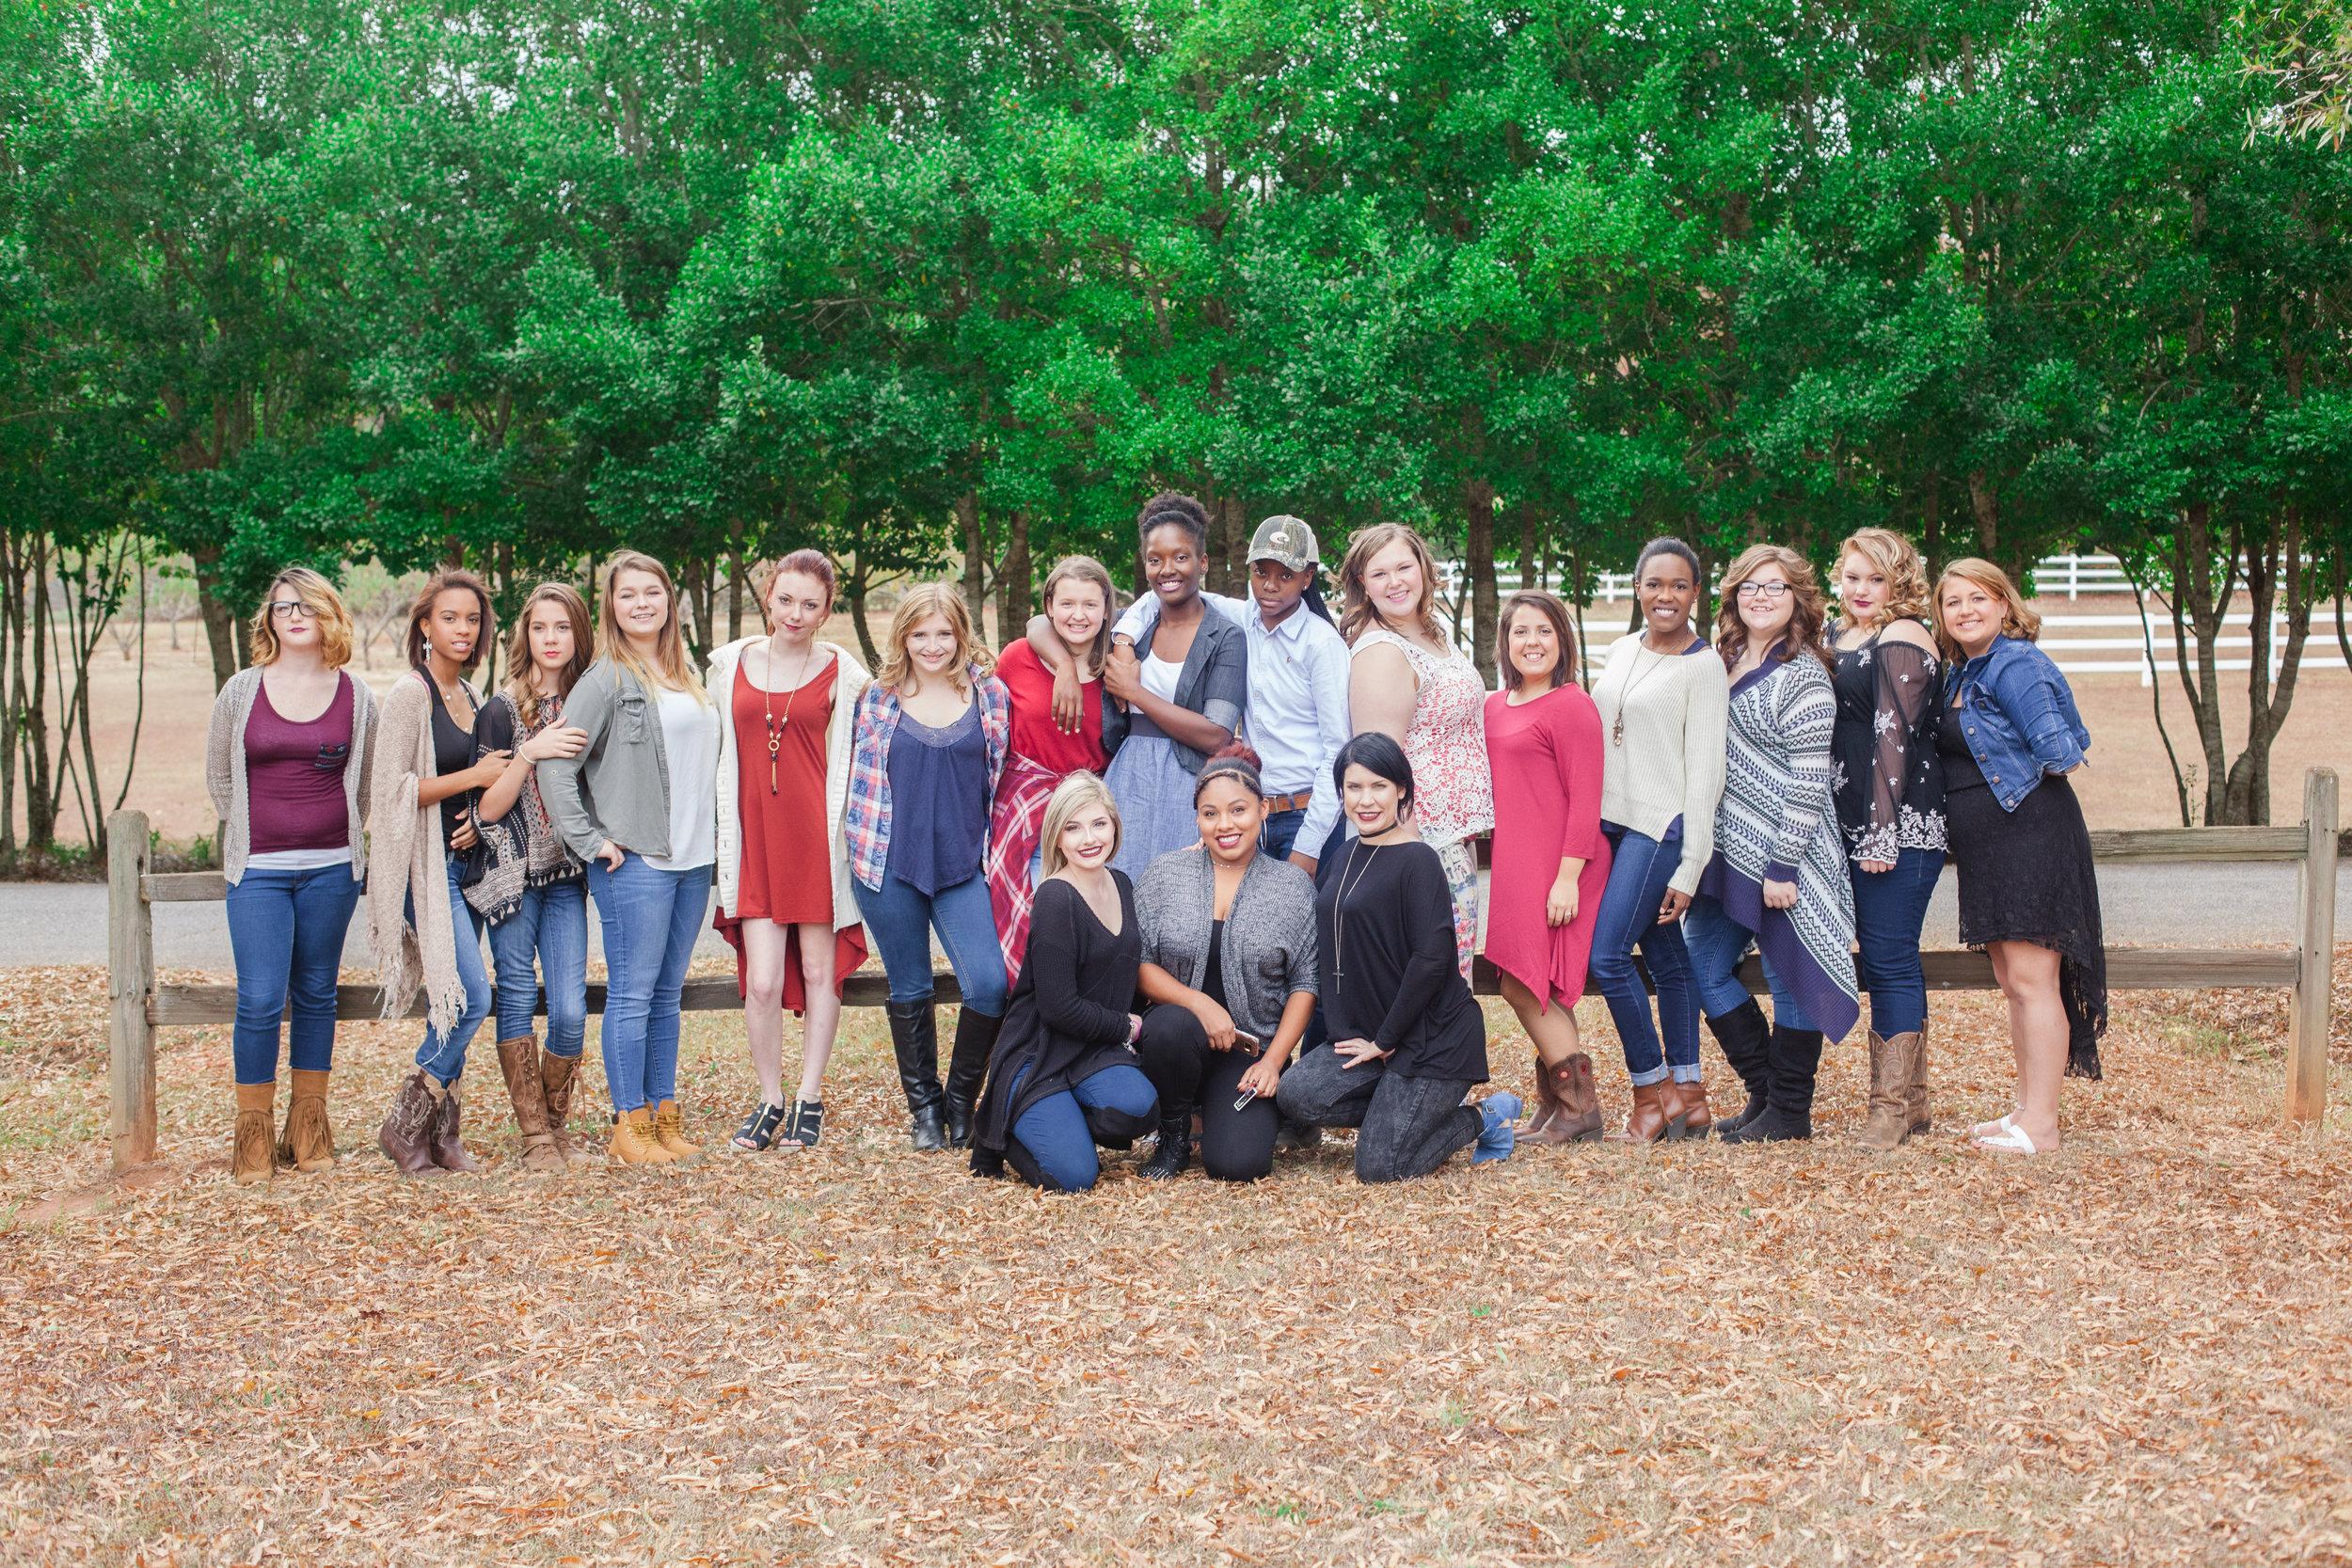 GIRLS RANCH - Tallapoosa County, Alabama